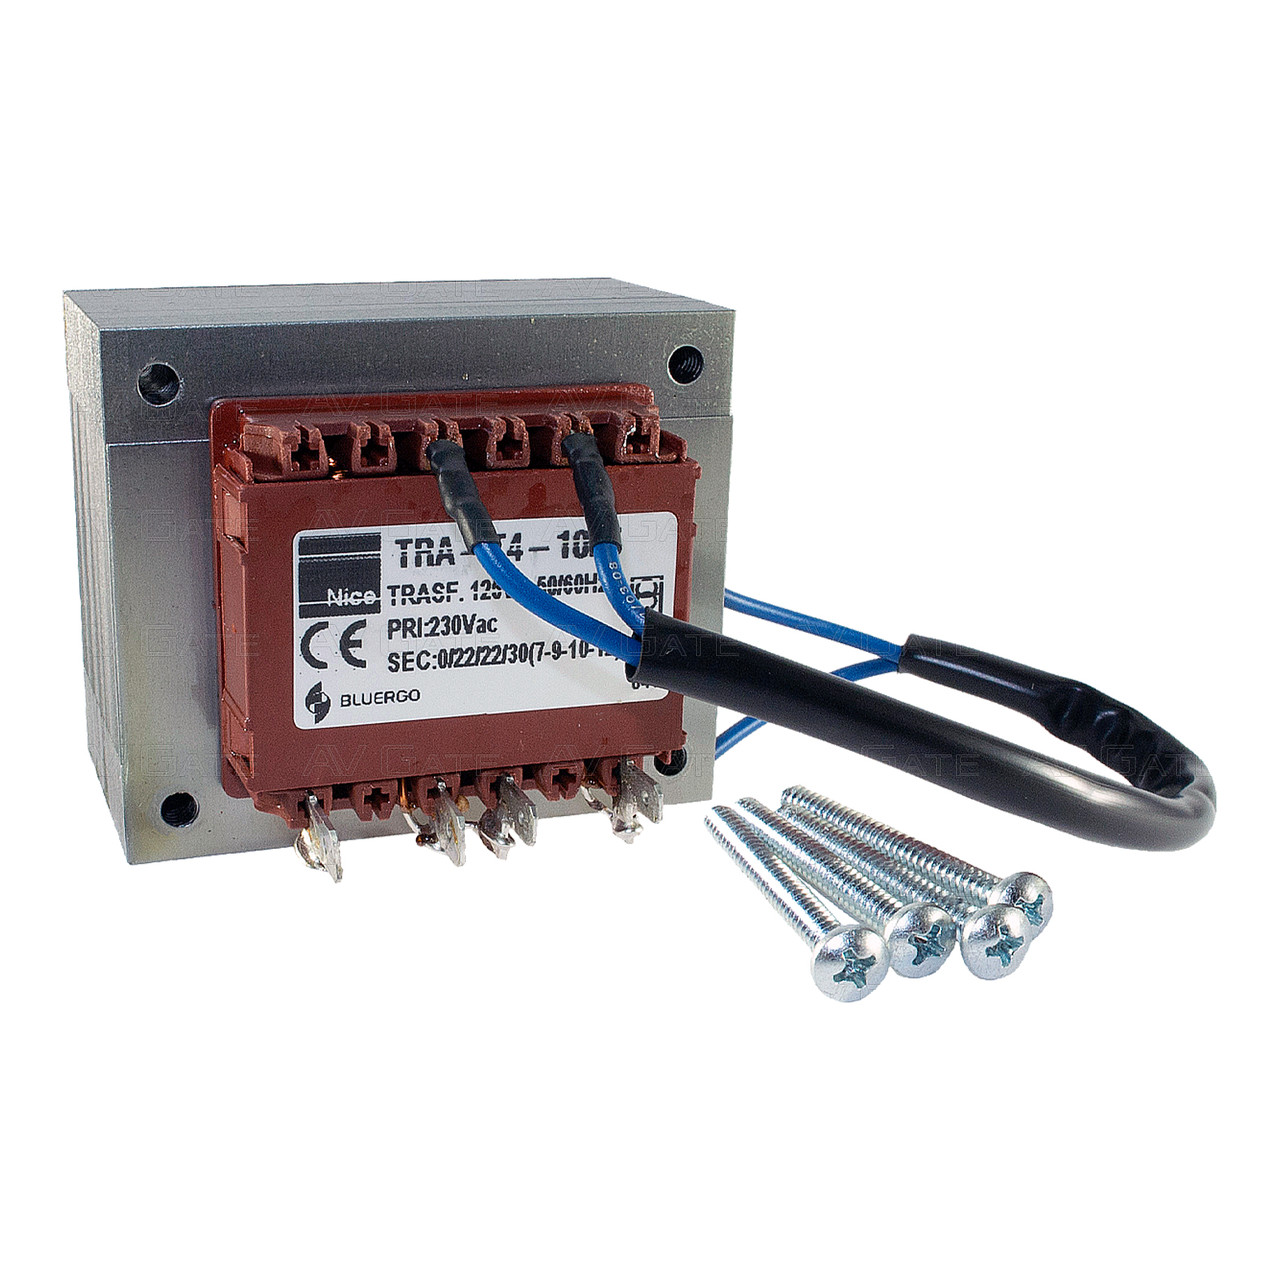 Трансформатор Nice SHEL TRA-T4.1025